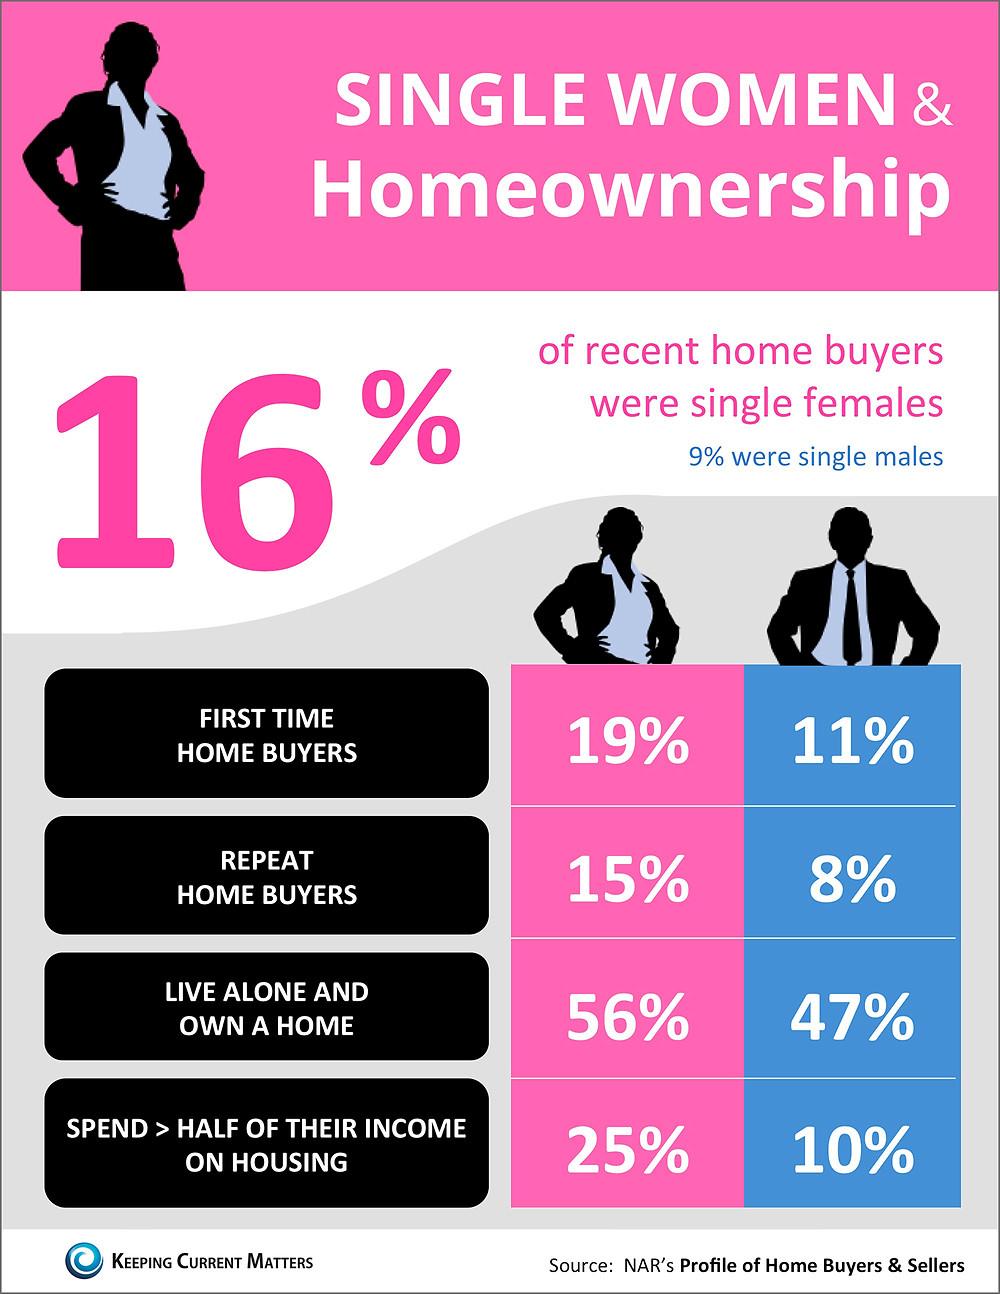 Single Women & Homeownership [INFOGRAPHIC] | Simplifying The Market